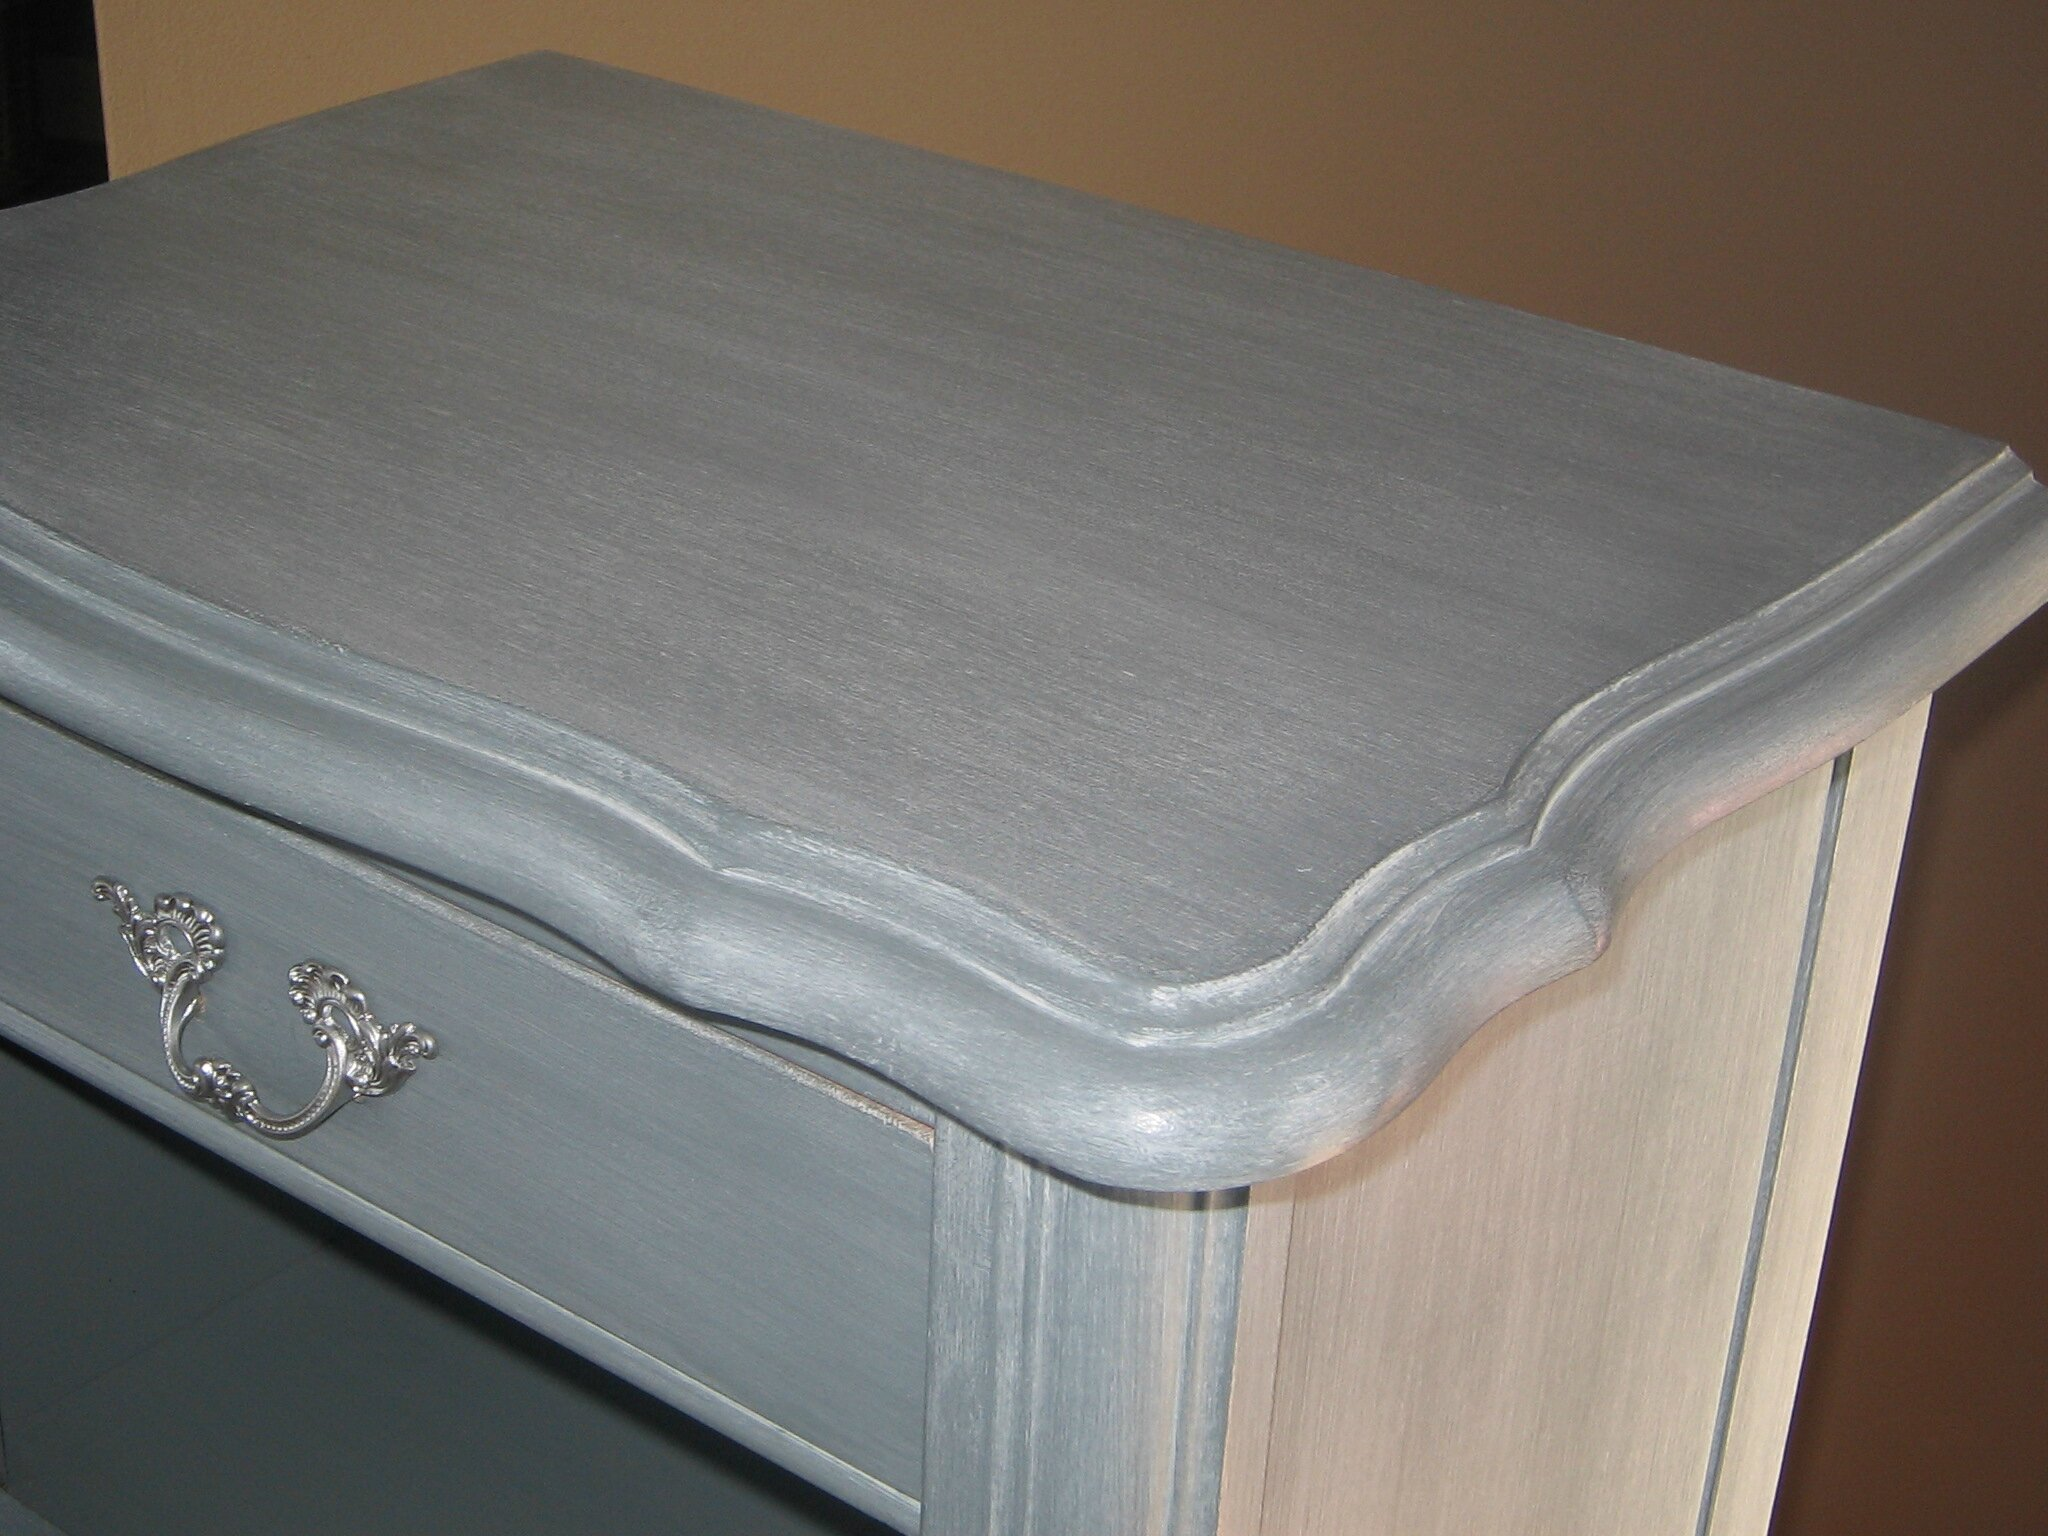 Chevet shabby chic relooking de meubles nadr nov - Table de chevet argente ...